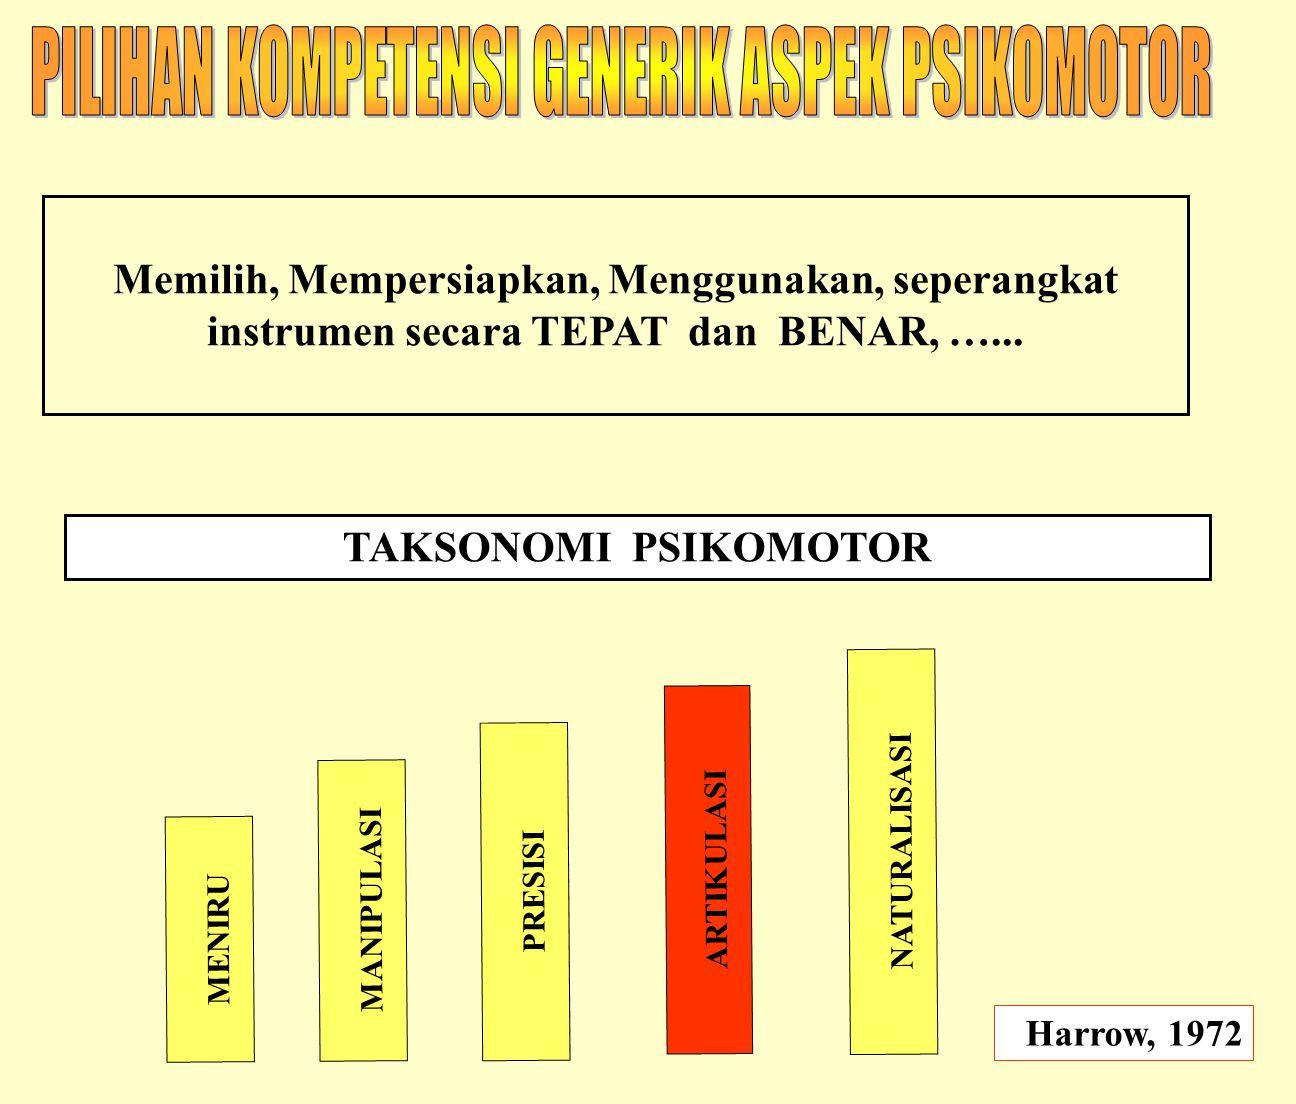 PILIHAN KOMPETENSI GENERIK ASPEK PSIKOMOTOR